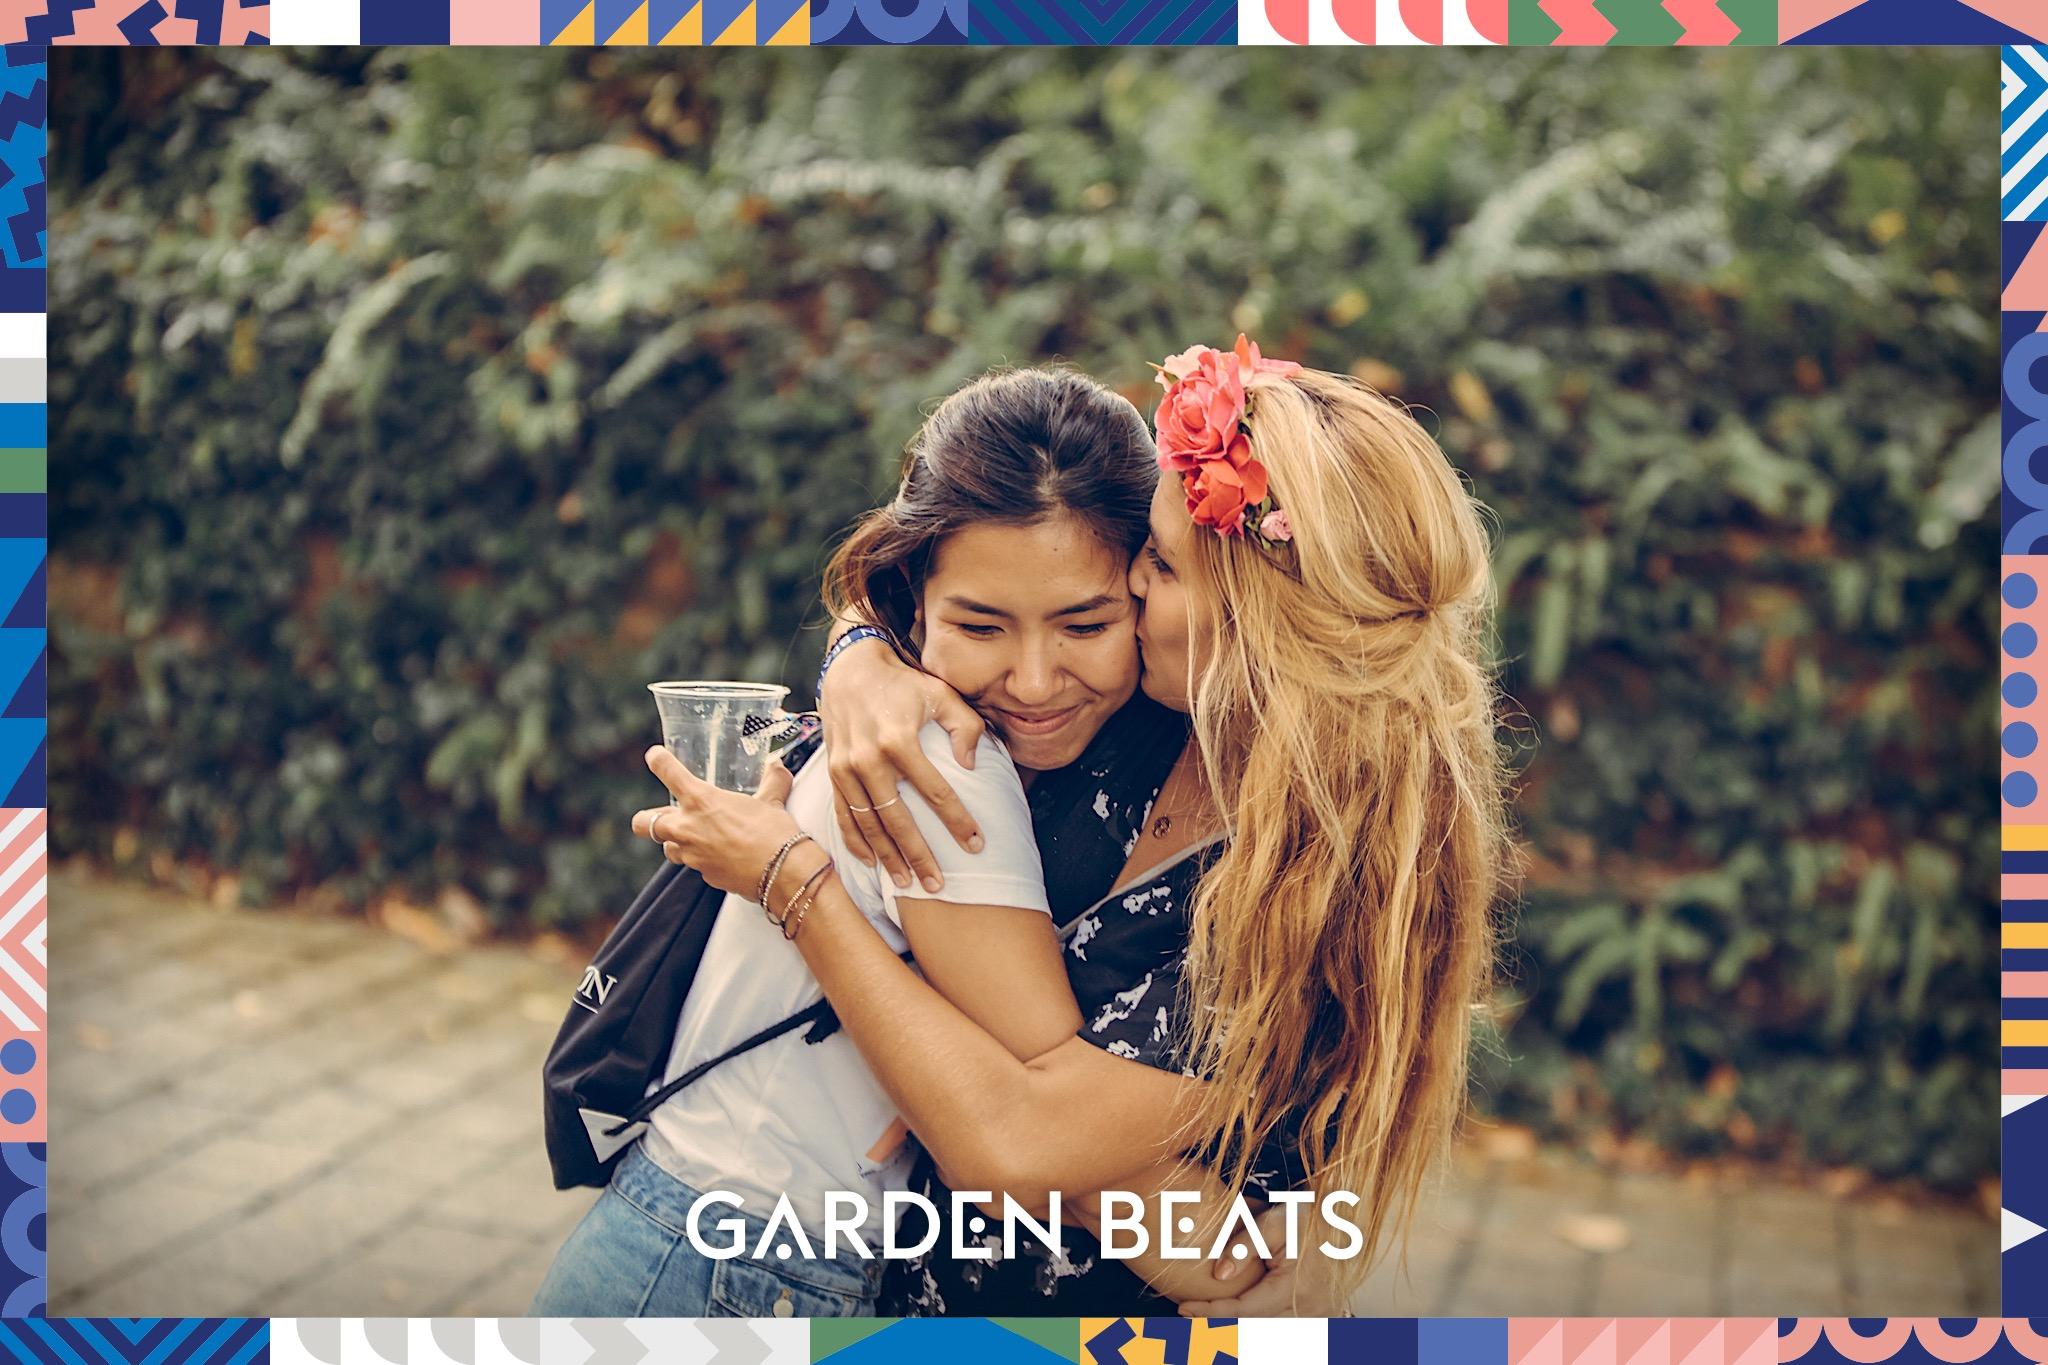 03032018_GardenBeats_Colossal382_Watermarked.jpg